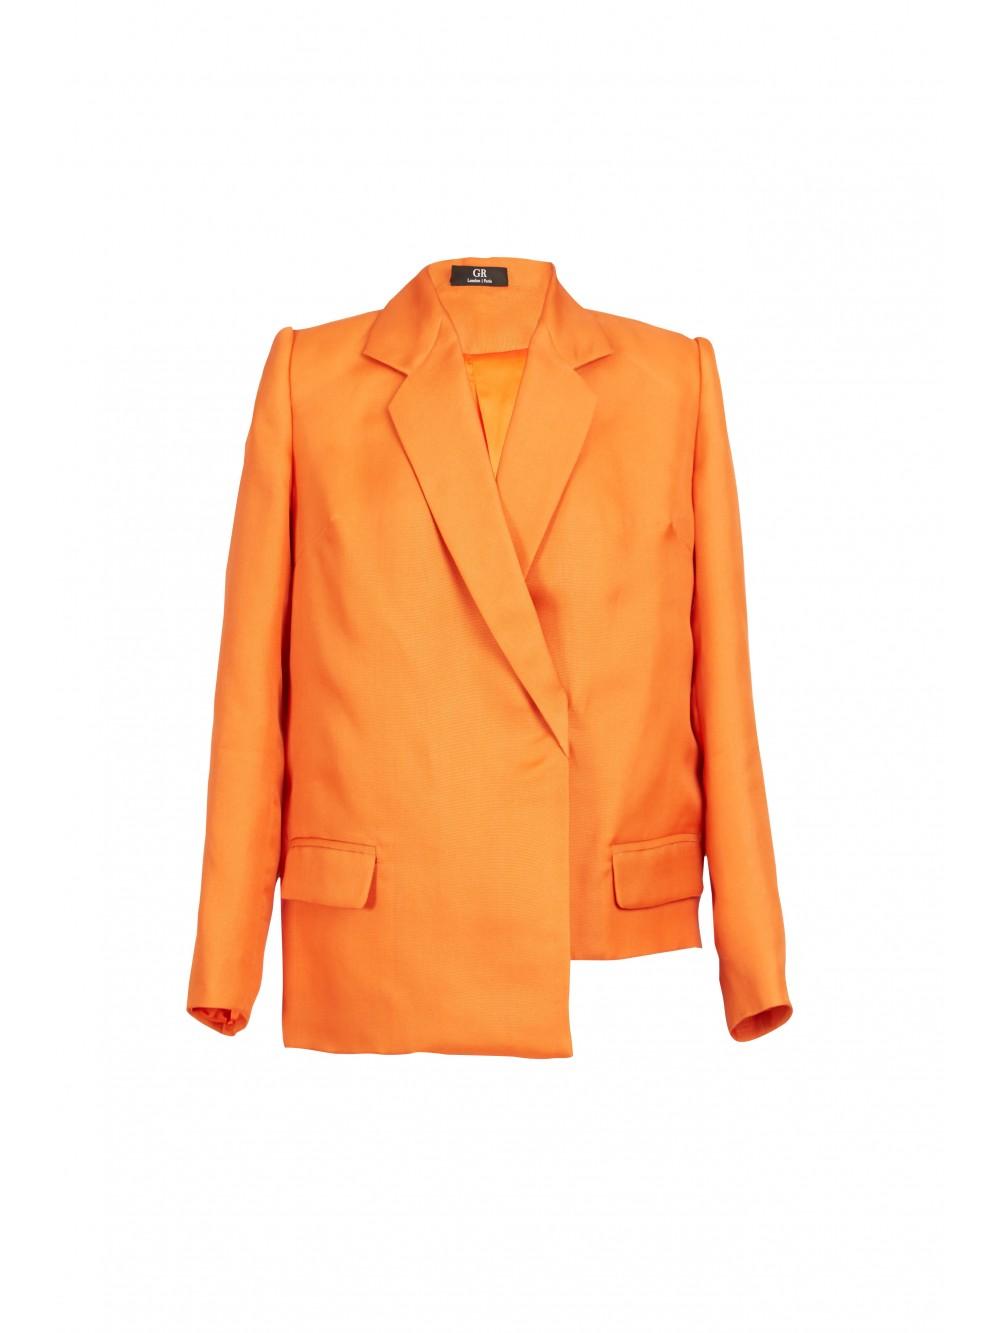 Oversized asymmetric suit    Joy